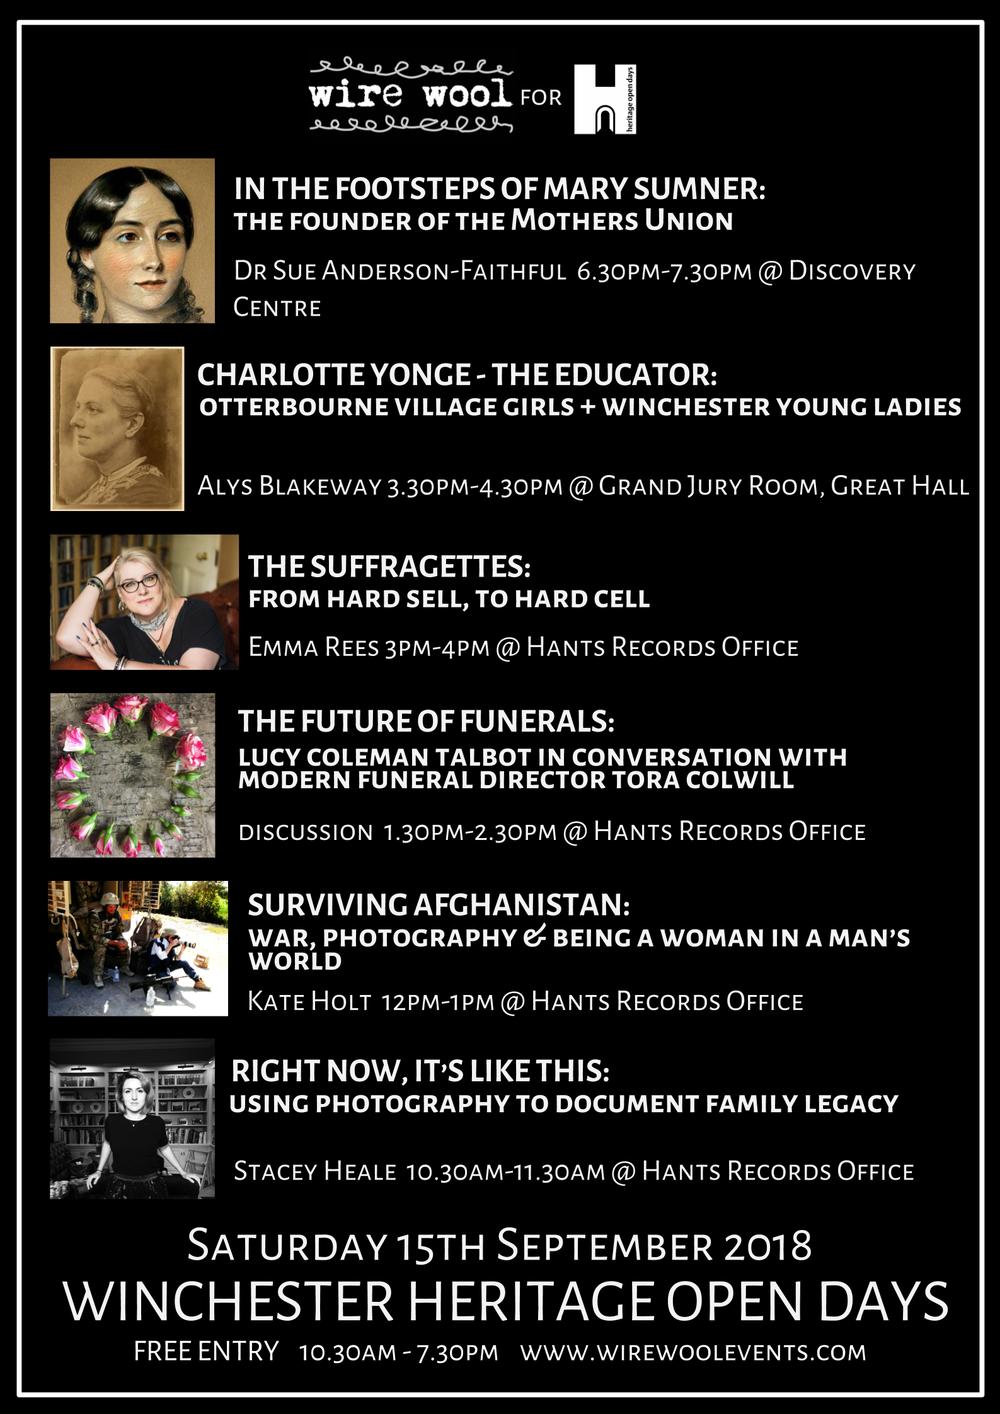 Winchester Heritage Open Days: Extraordinary Women Saturday 15 September 2018